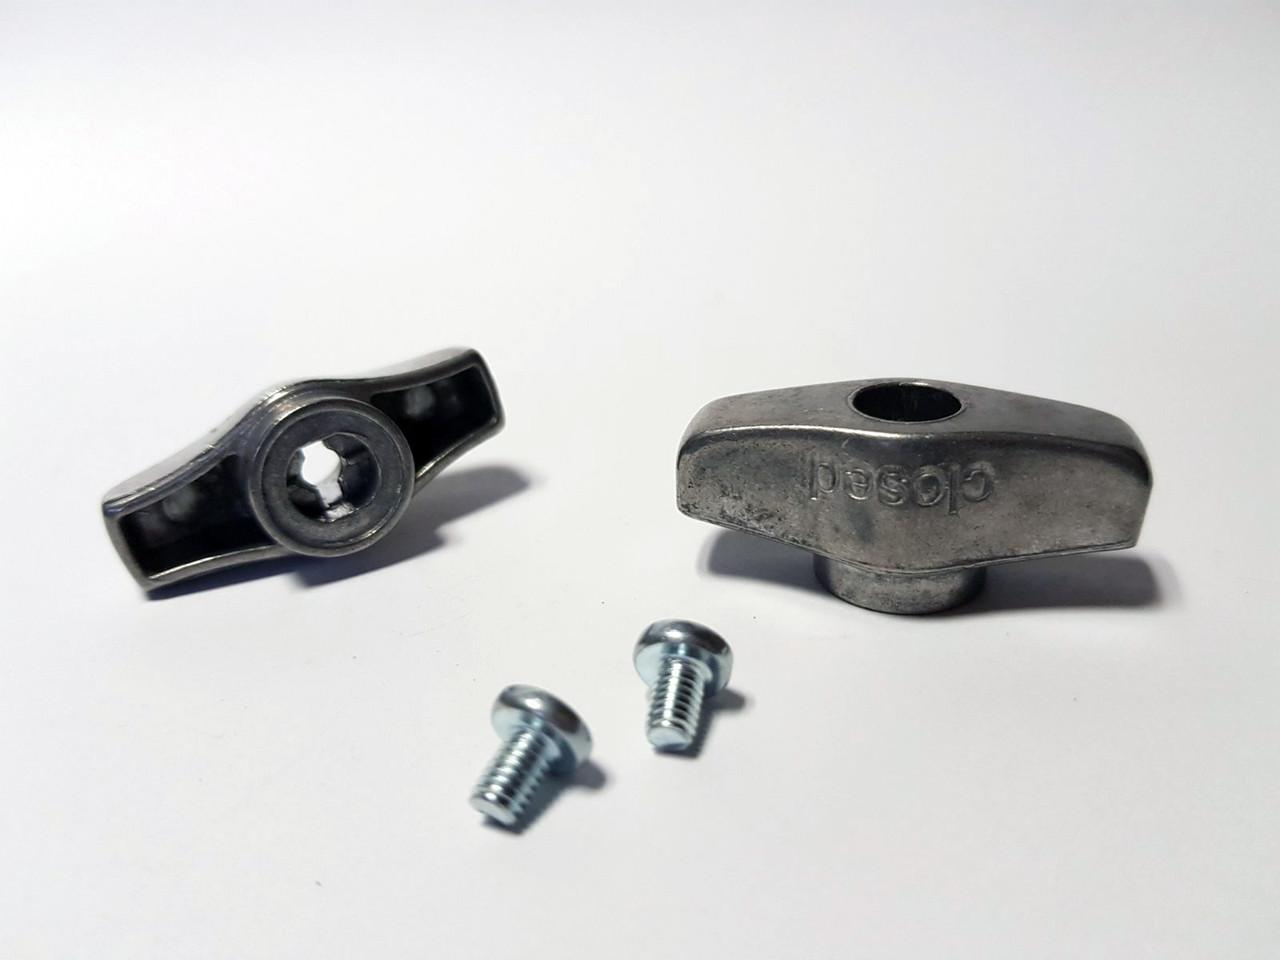 Ручка крана подпитки (2шт) на газовый котел Vaillant atmoTEC, turboTEC Pro\Plus mini R1 0020010292